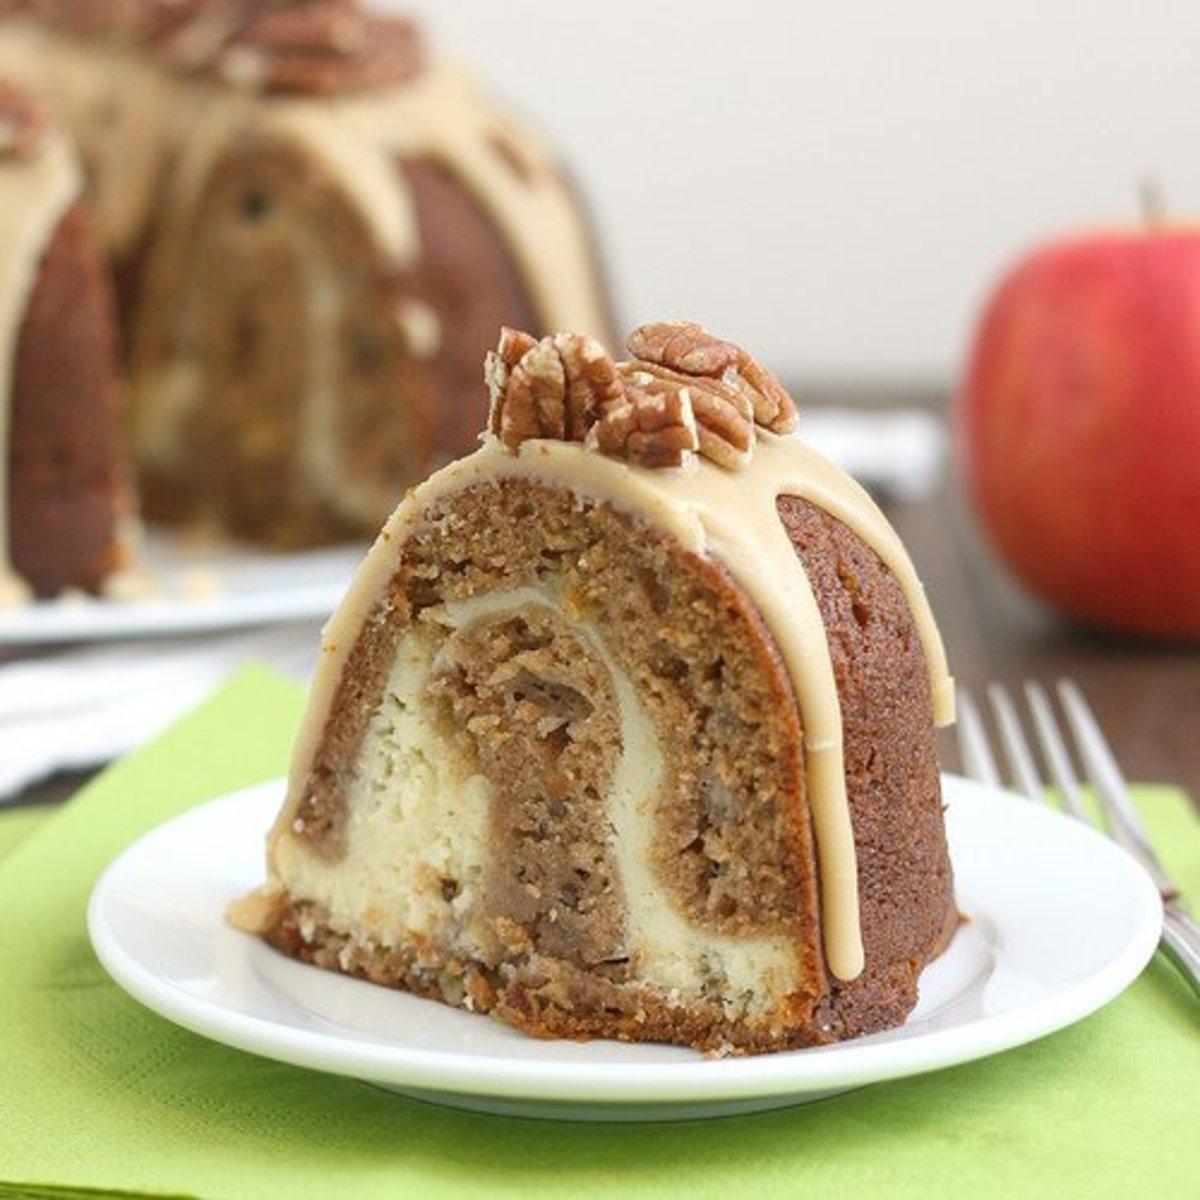 Exploring Bundt Cakes: Take Them Beyond Your Grandma's